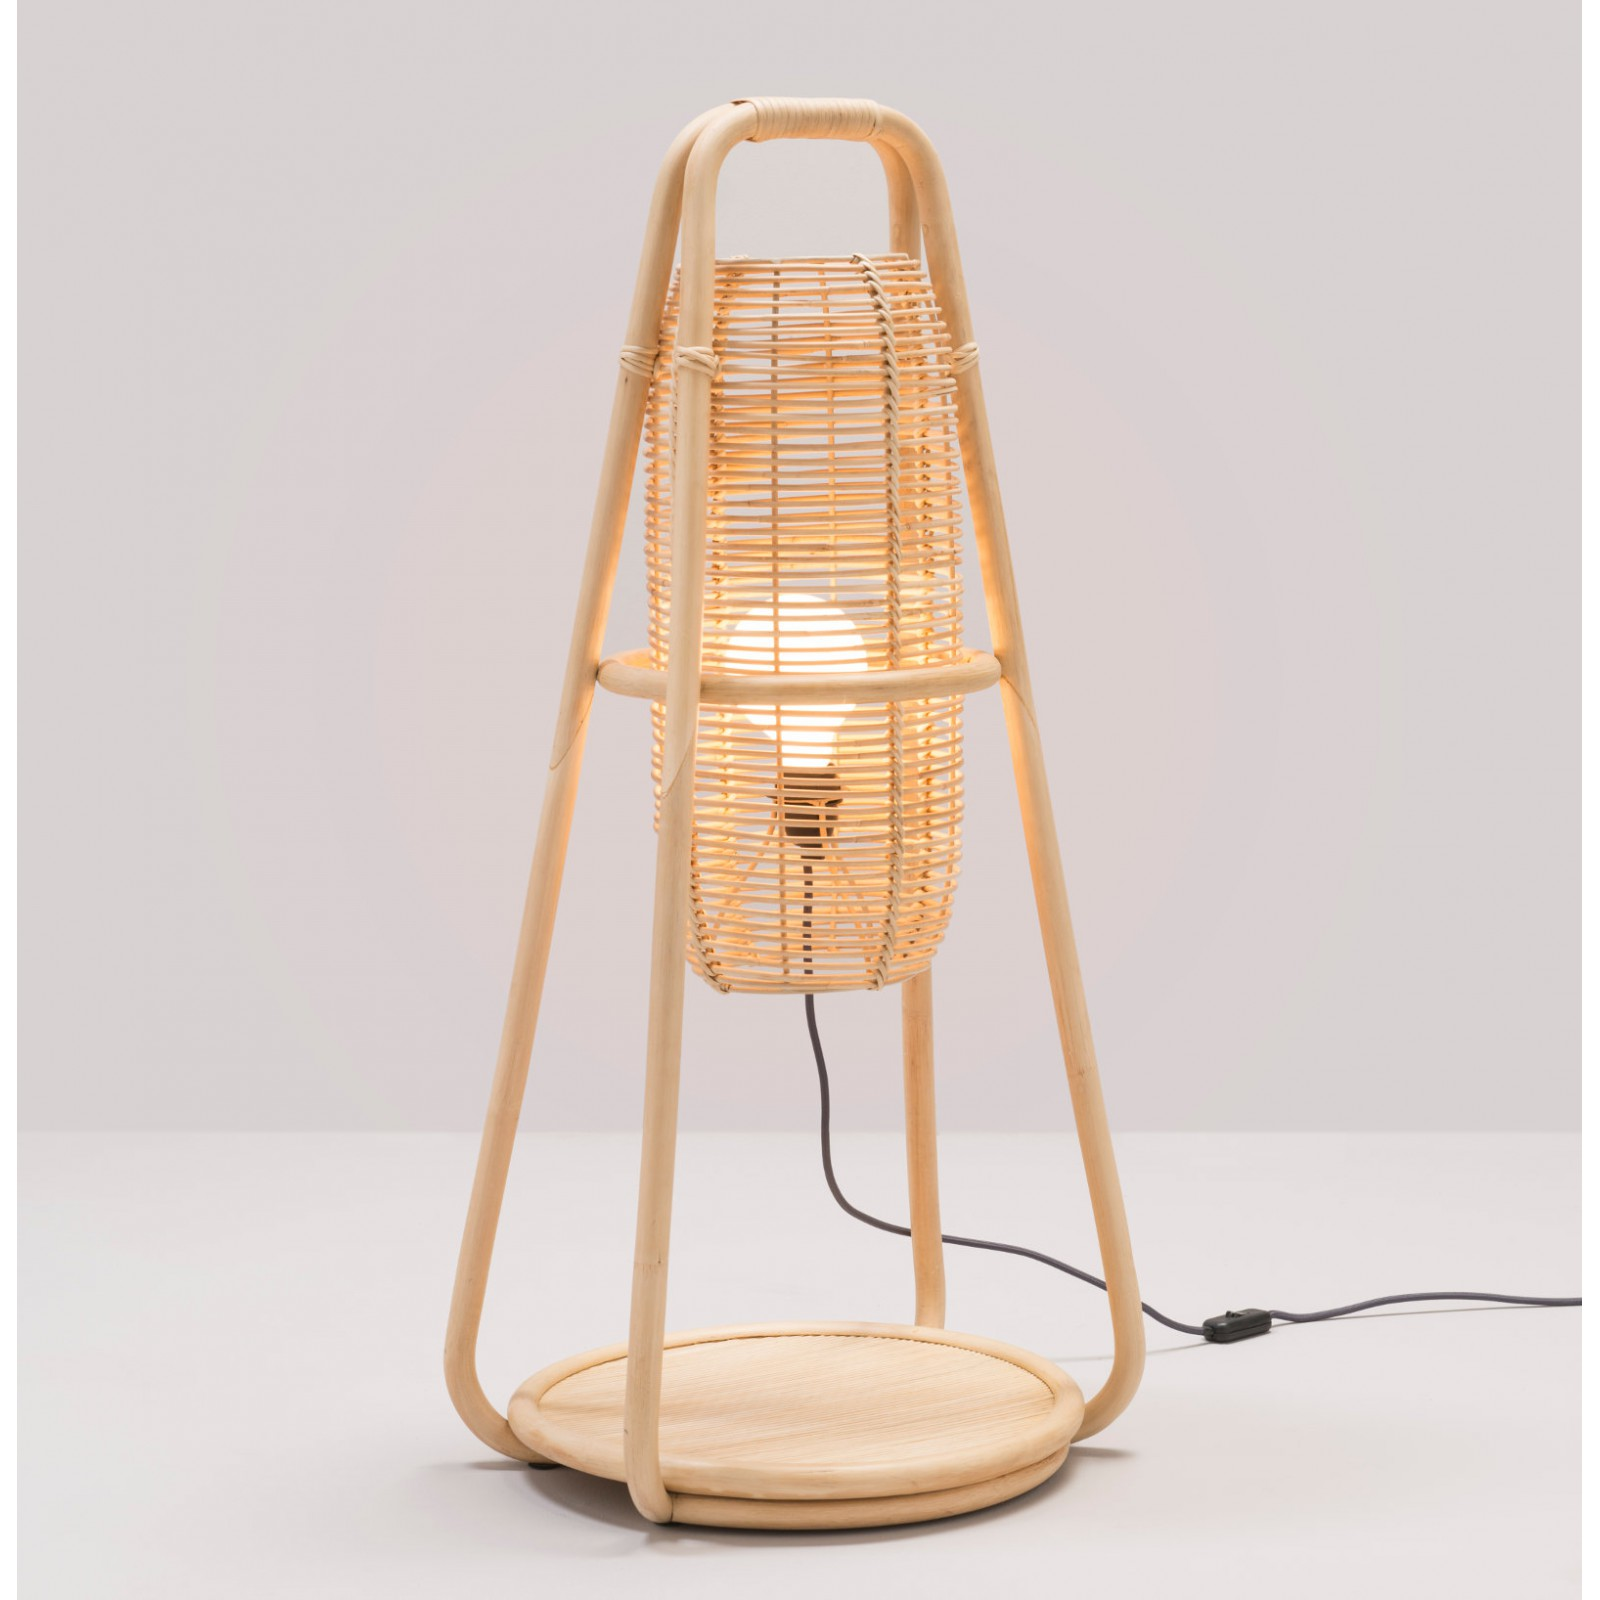 Michel En Nacelle À Jean Design Rotin Policar Par Lampe Poser W2E9IDH